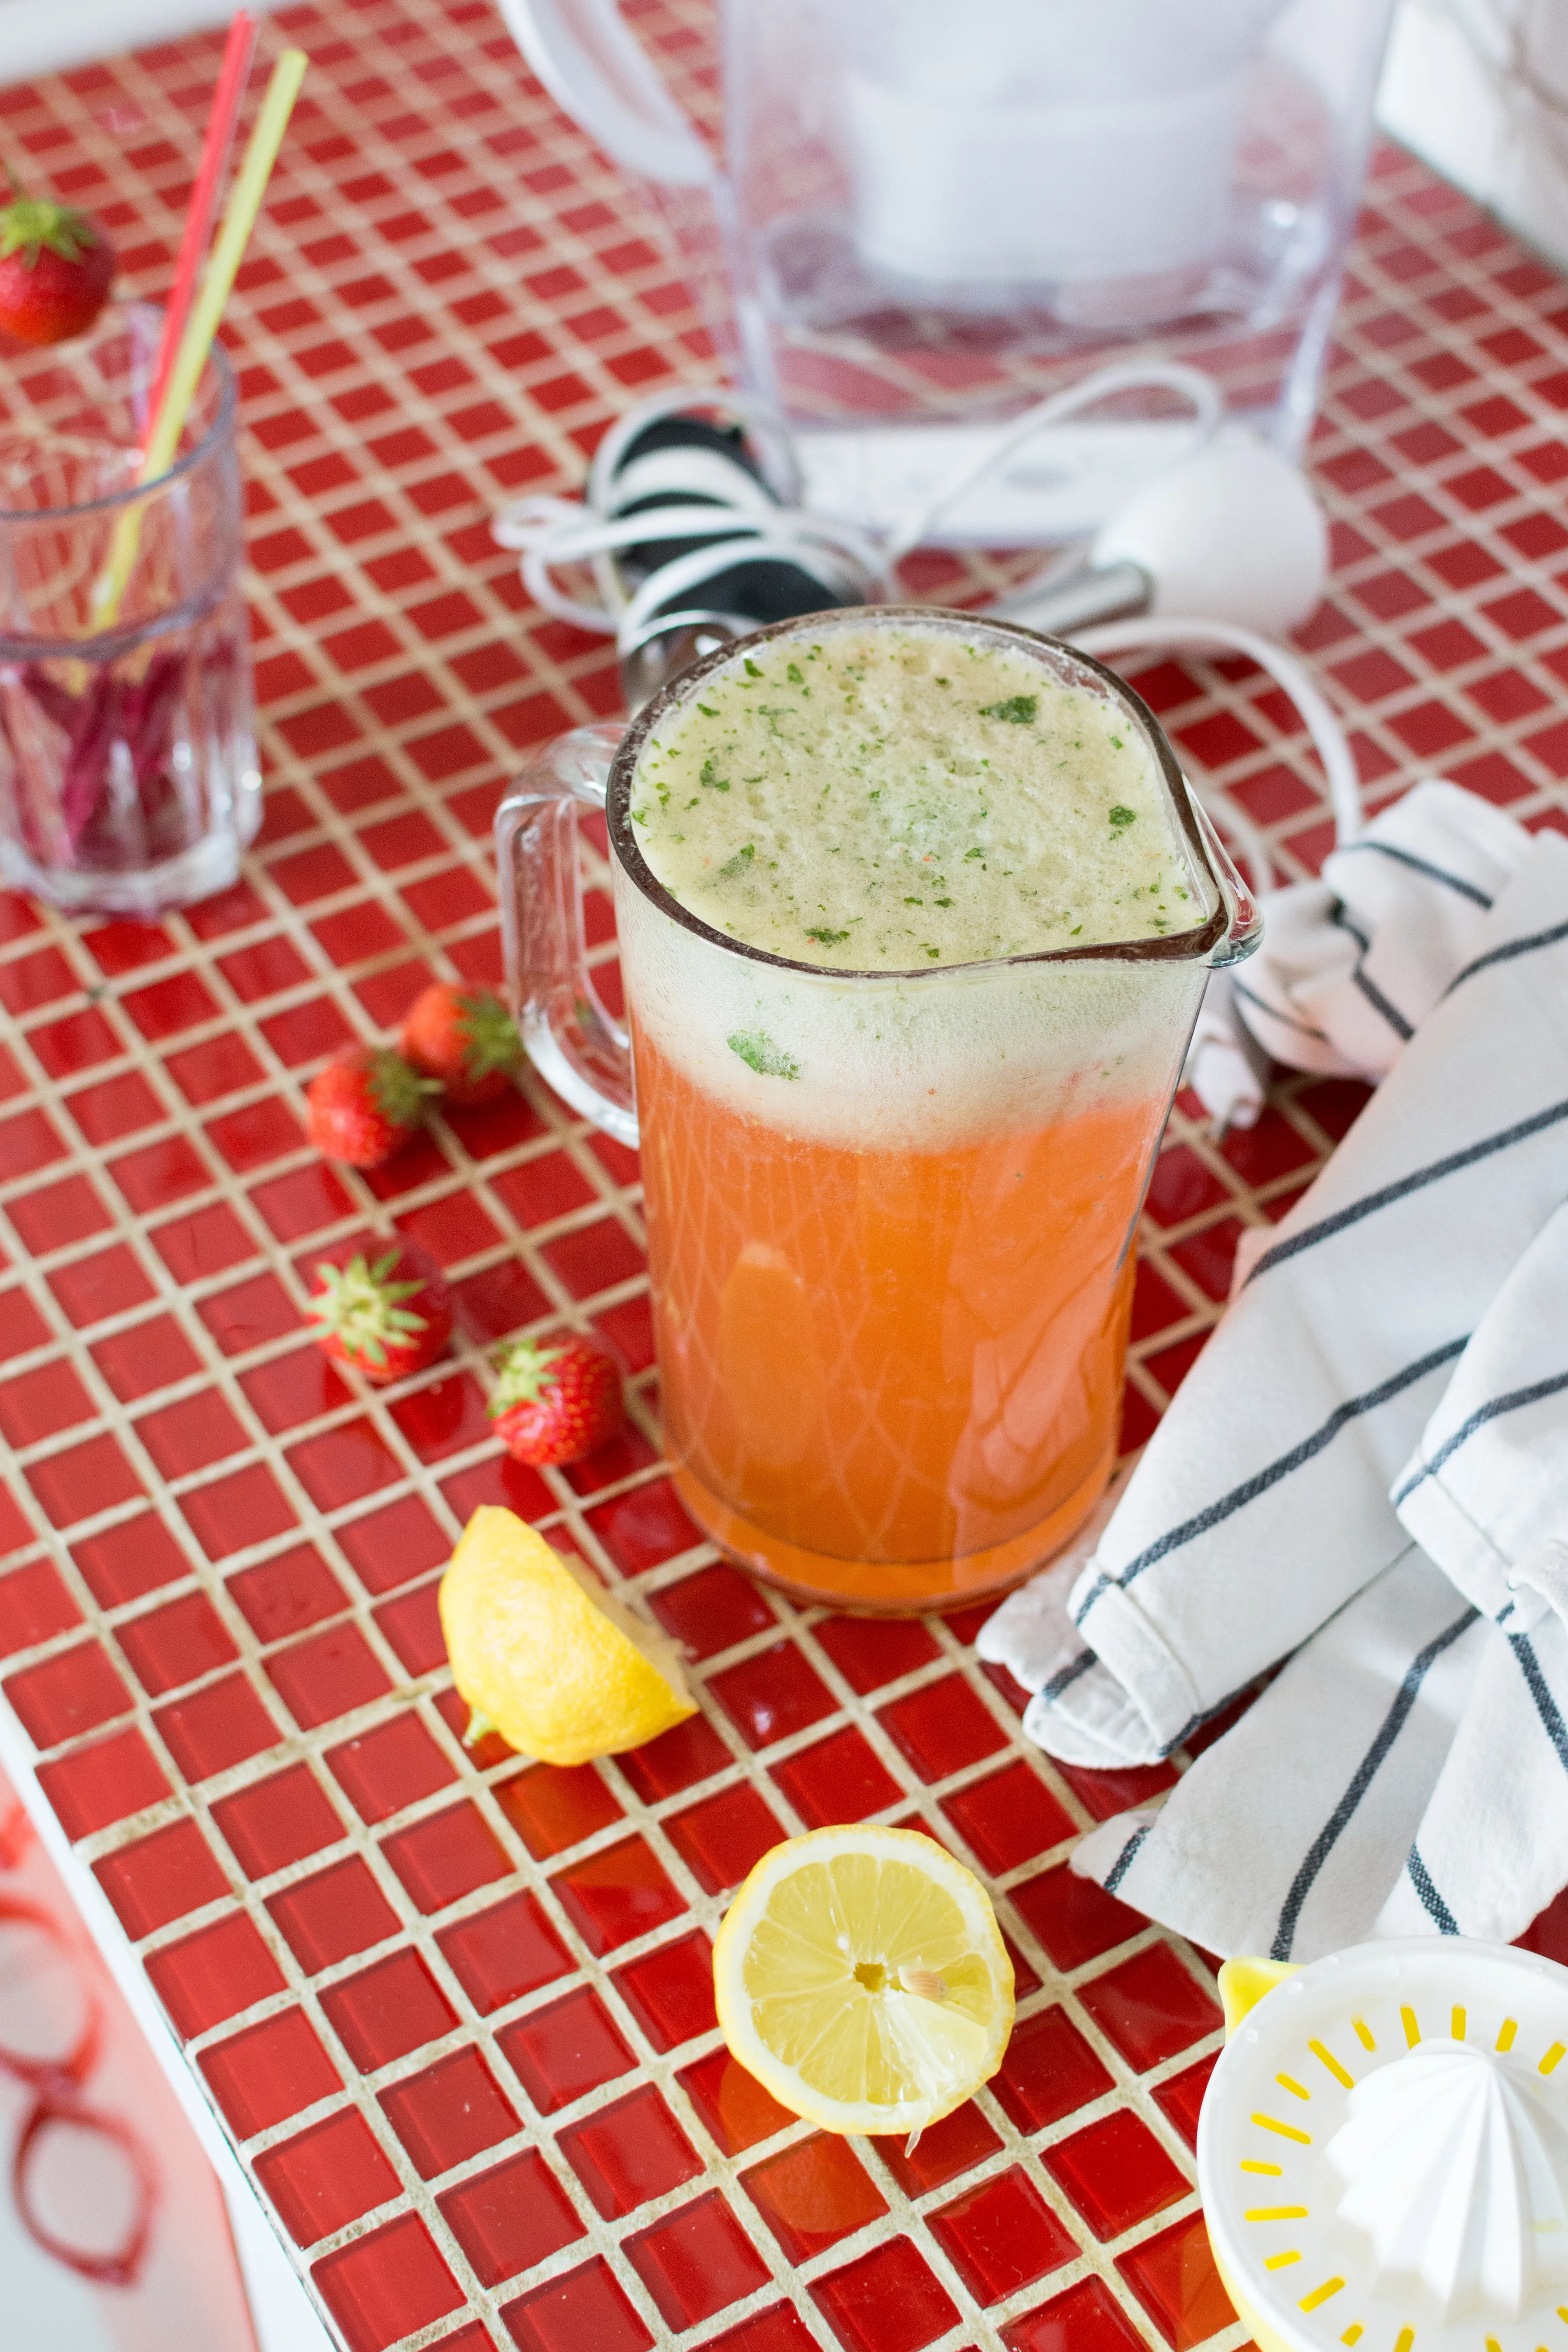 Homemade strawberry and basil lemonade